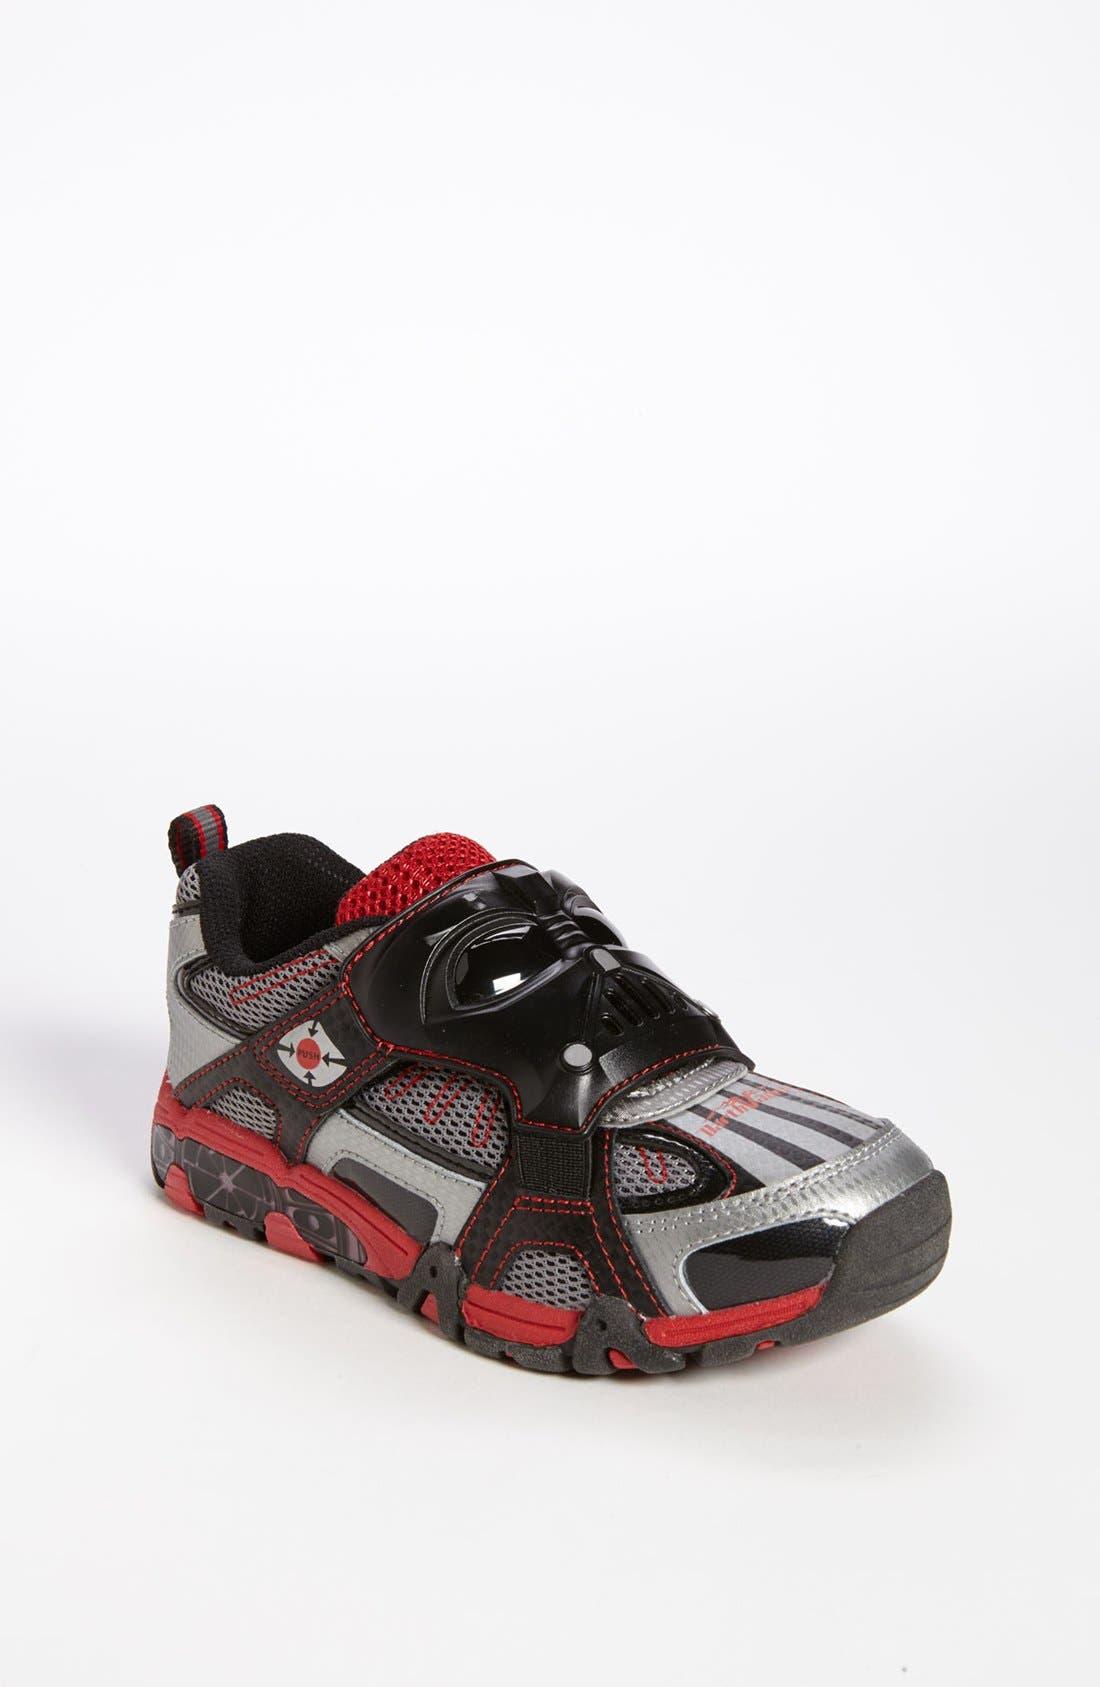 Main Image - Stride Rite 'Darth Vader™ - Light & Sound' Sneaker (Toddler & Little Kid)